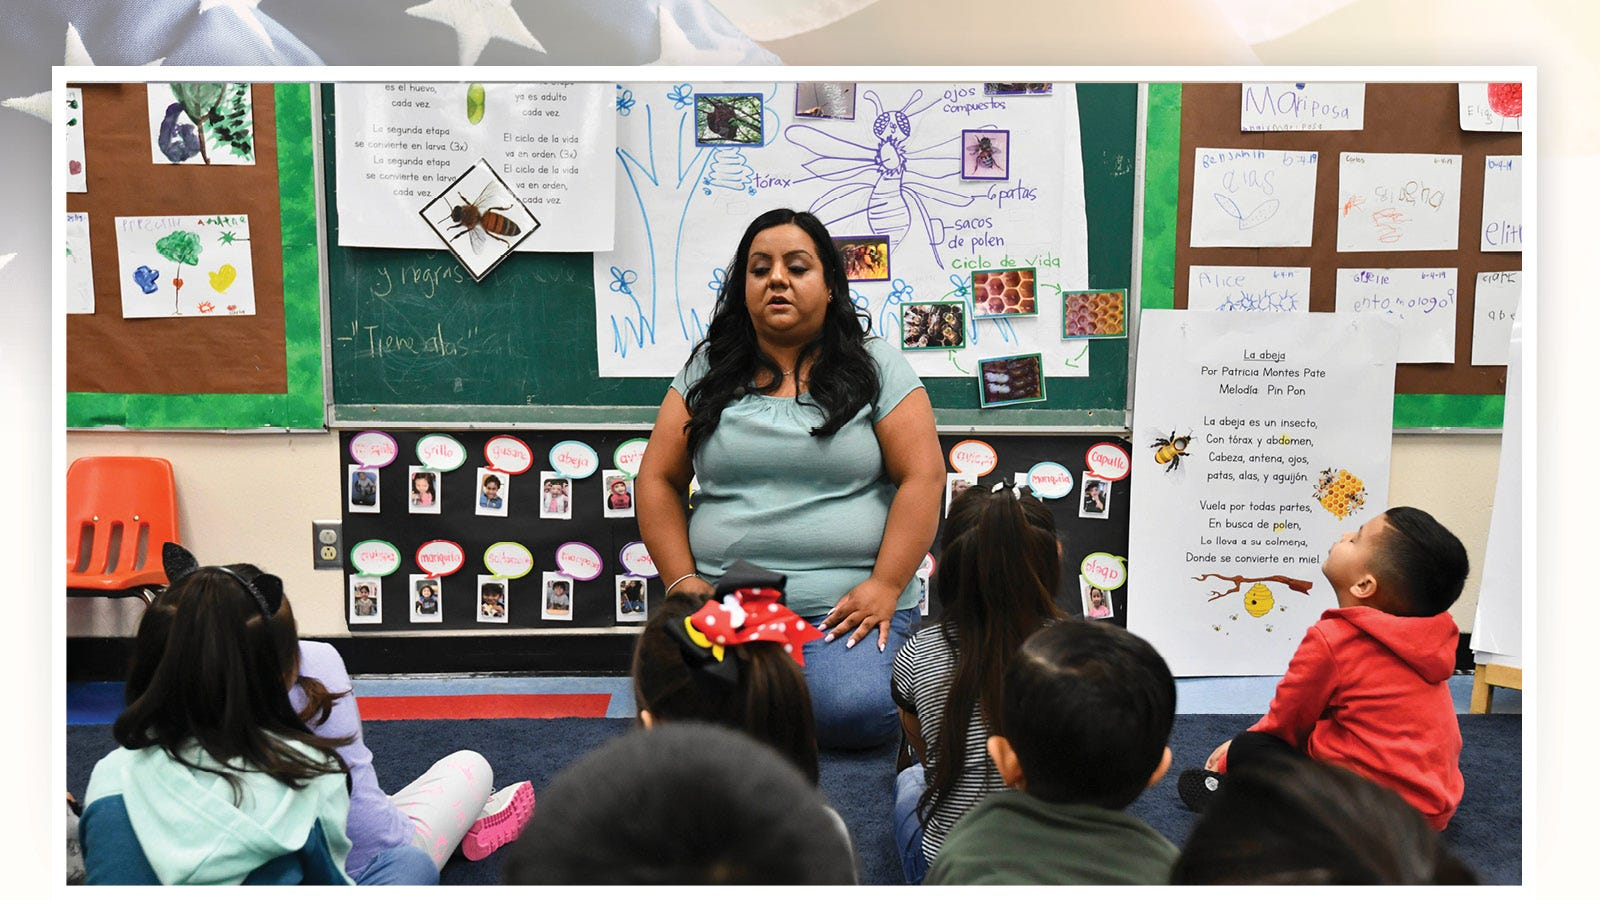 Rosa Ramirez is a preschool teacher at Gates Street Early Education Center in Los Angeles and teaches a class through a bilingual education program.